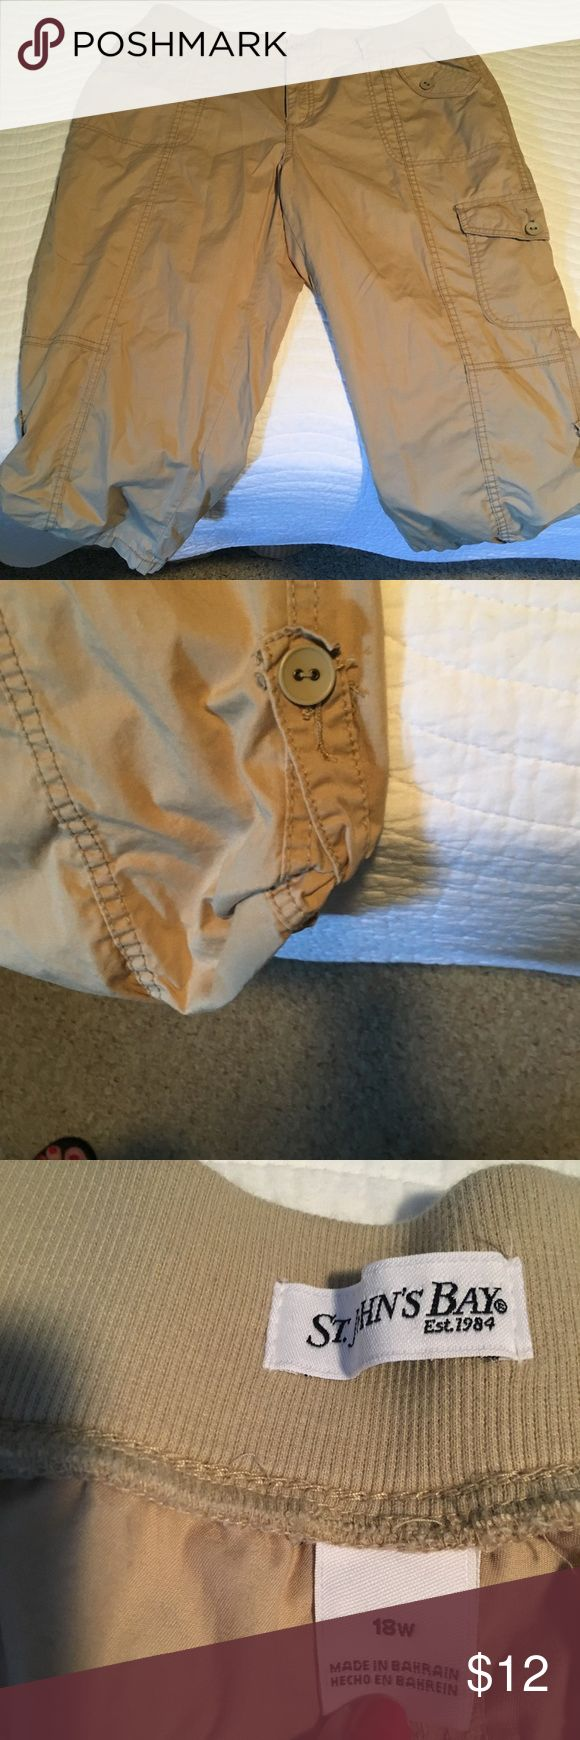 St. John's Bay 18W khaki Capri's These Khaki Capri's have an adjustable leg. St Johns Bay Pants Ankle & Cropped